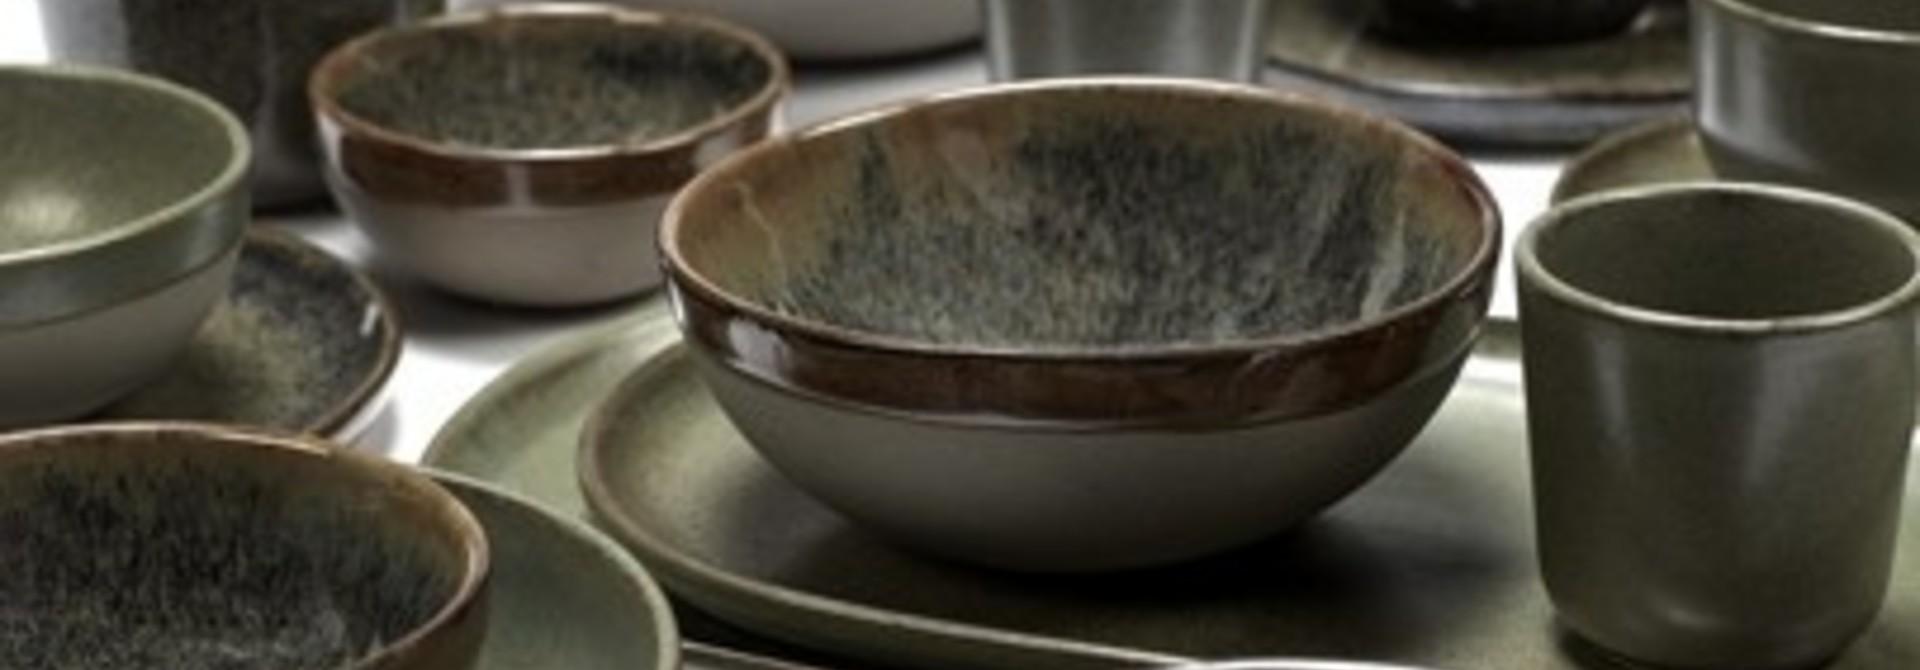 Bowls - Serax